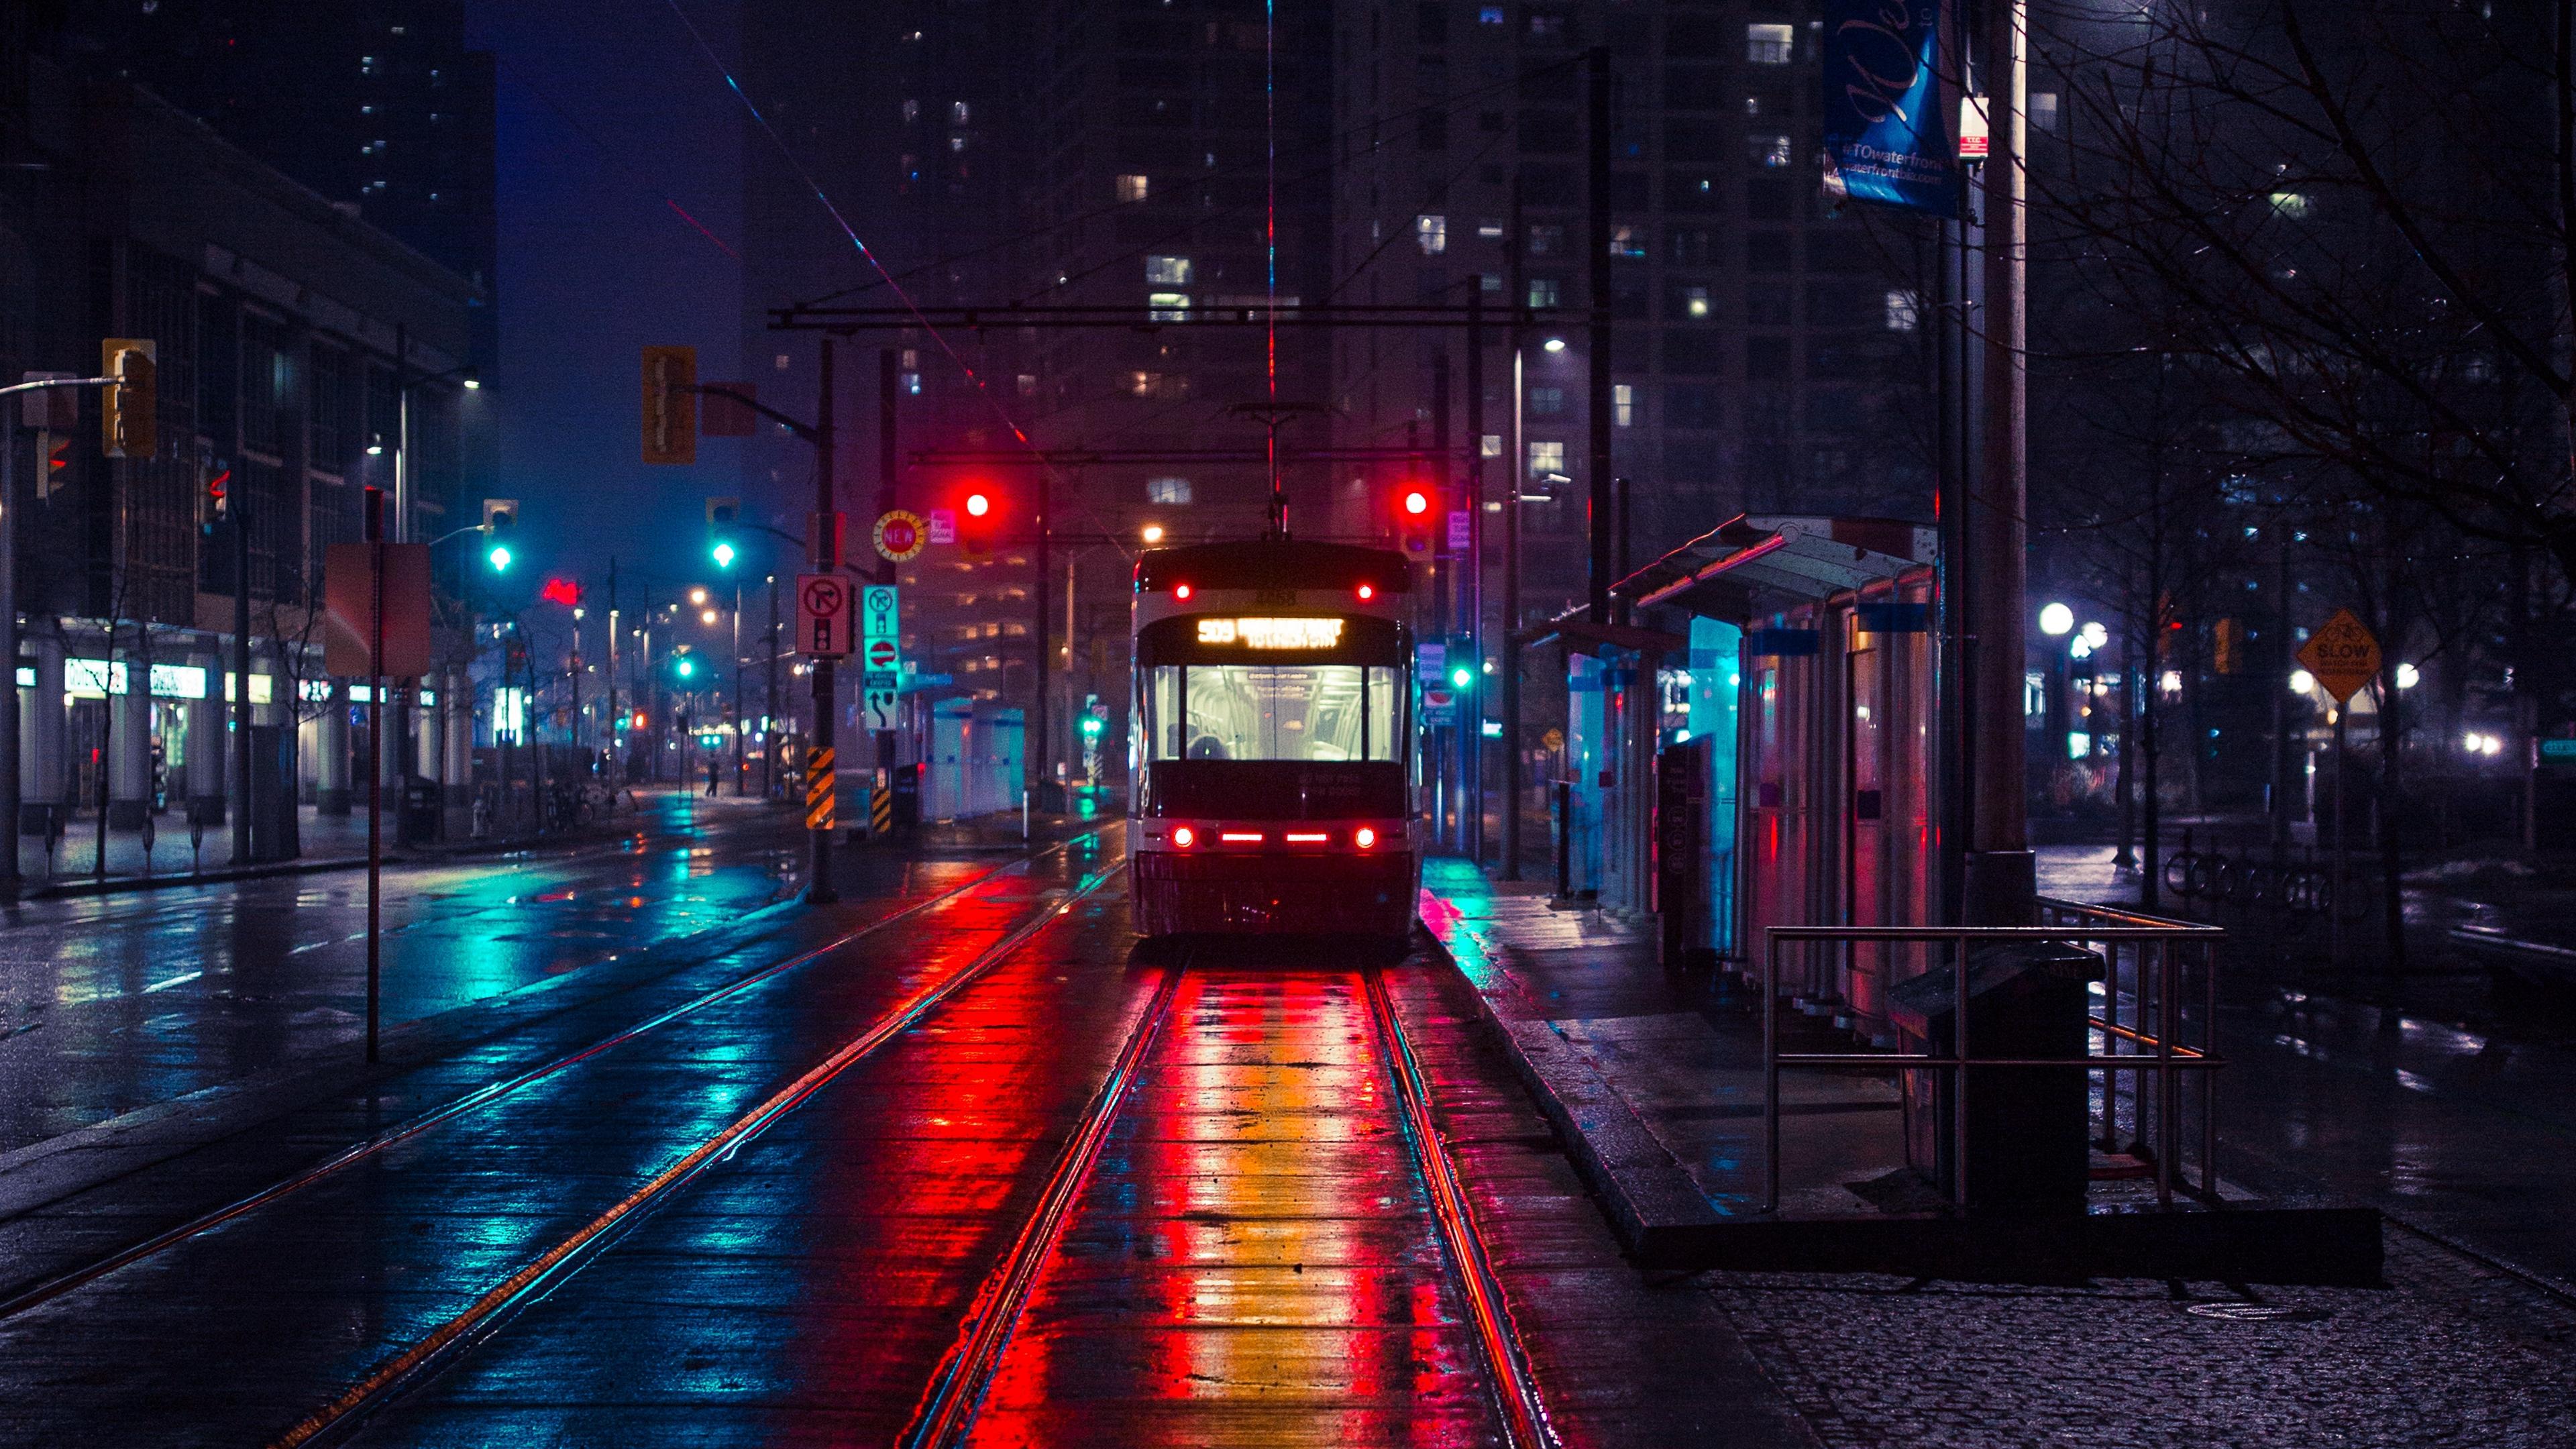 trolley stop city evening lighting 4k 1538068869 - trolley, stop, city, evening, lighting 4k - trolley, Stop, City